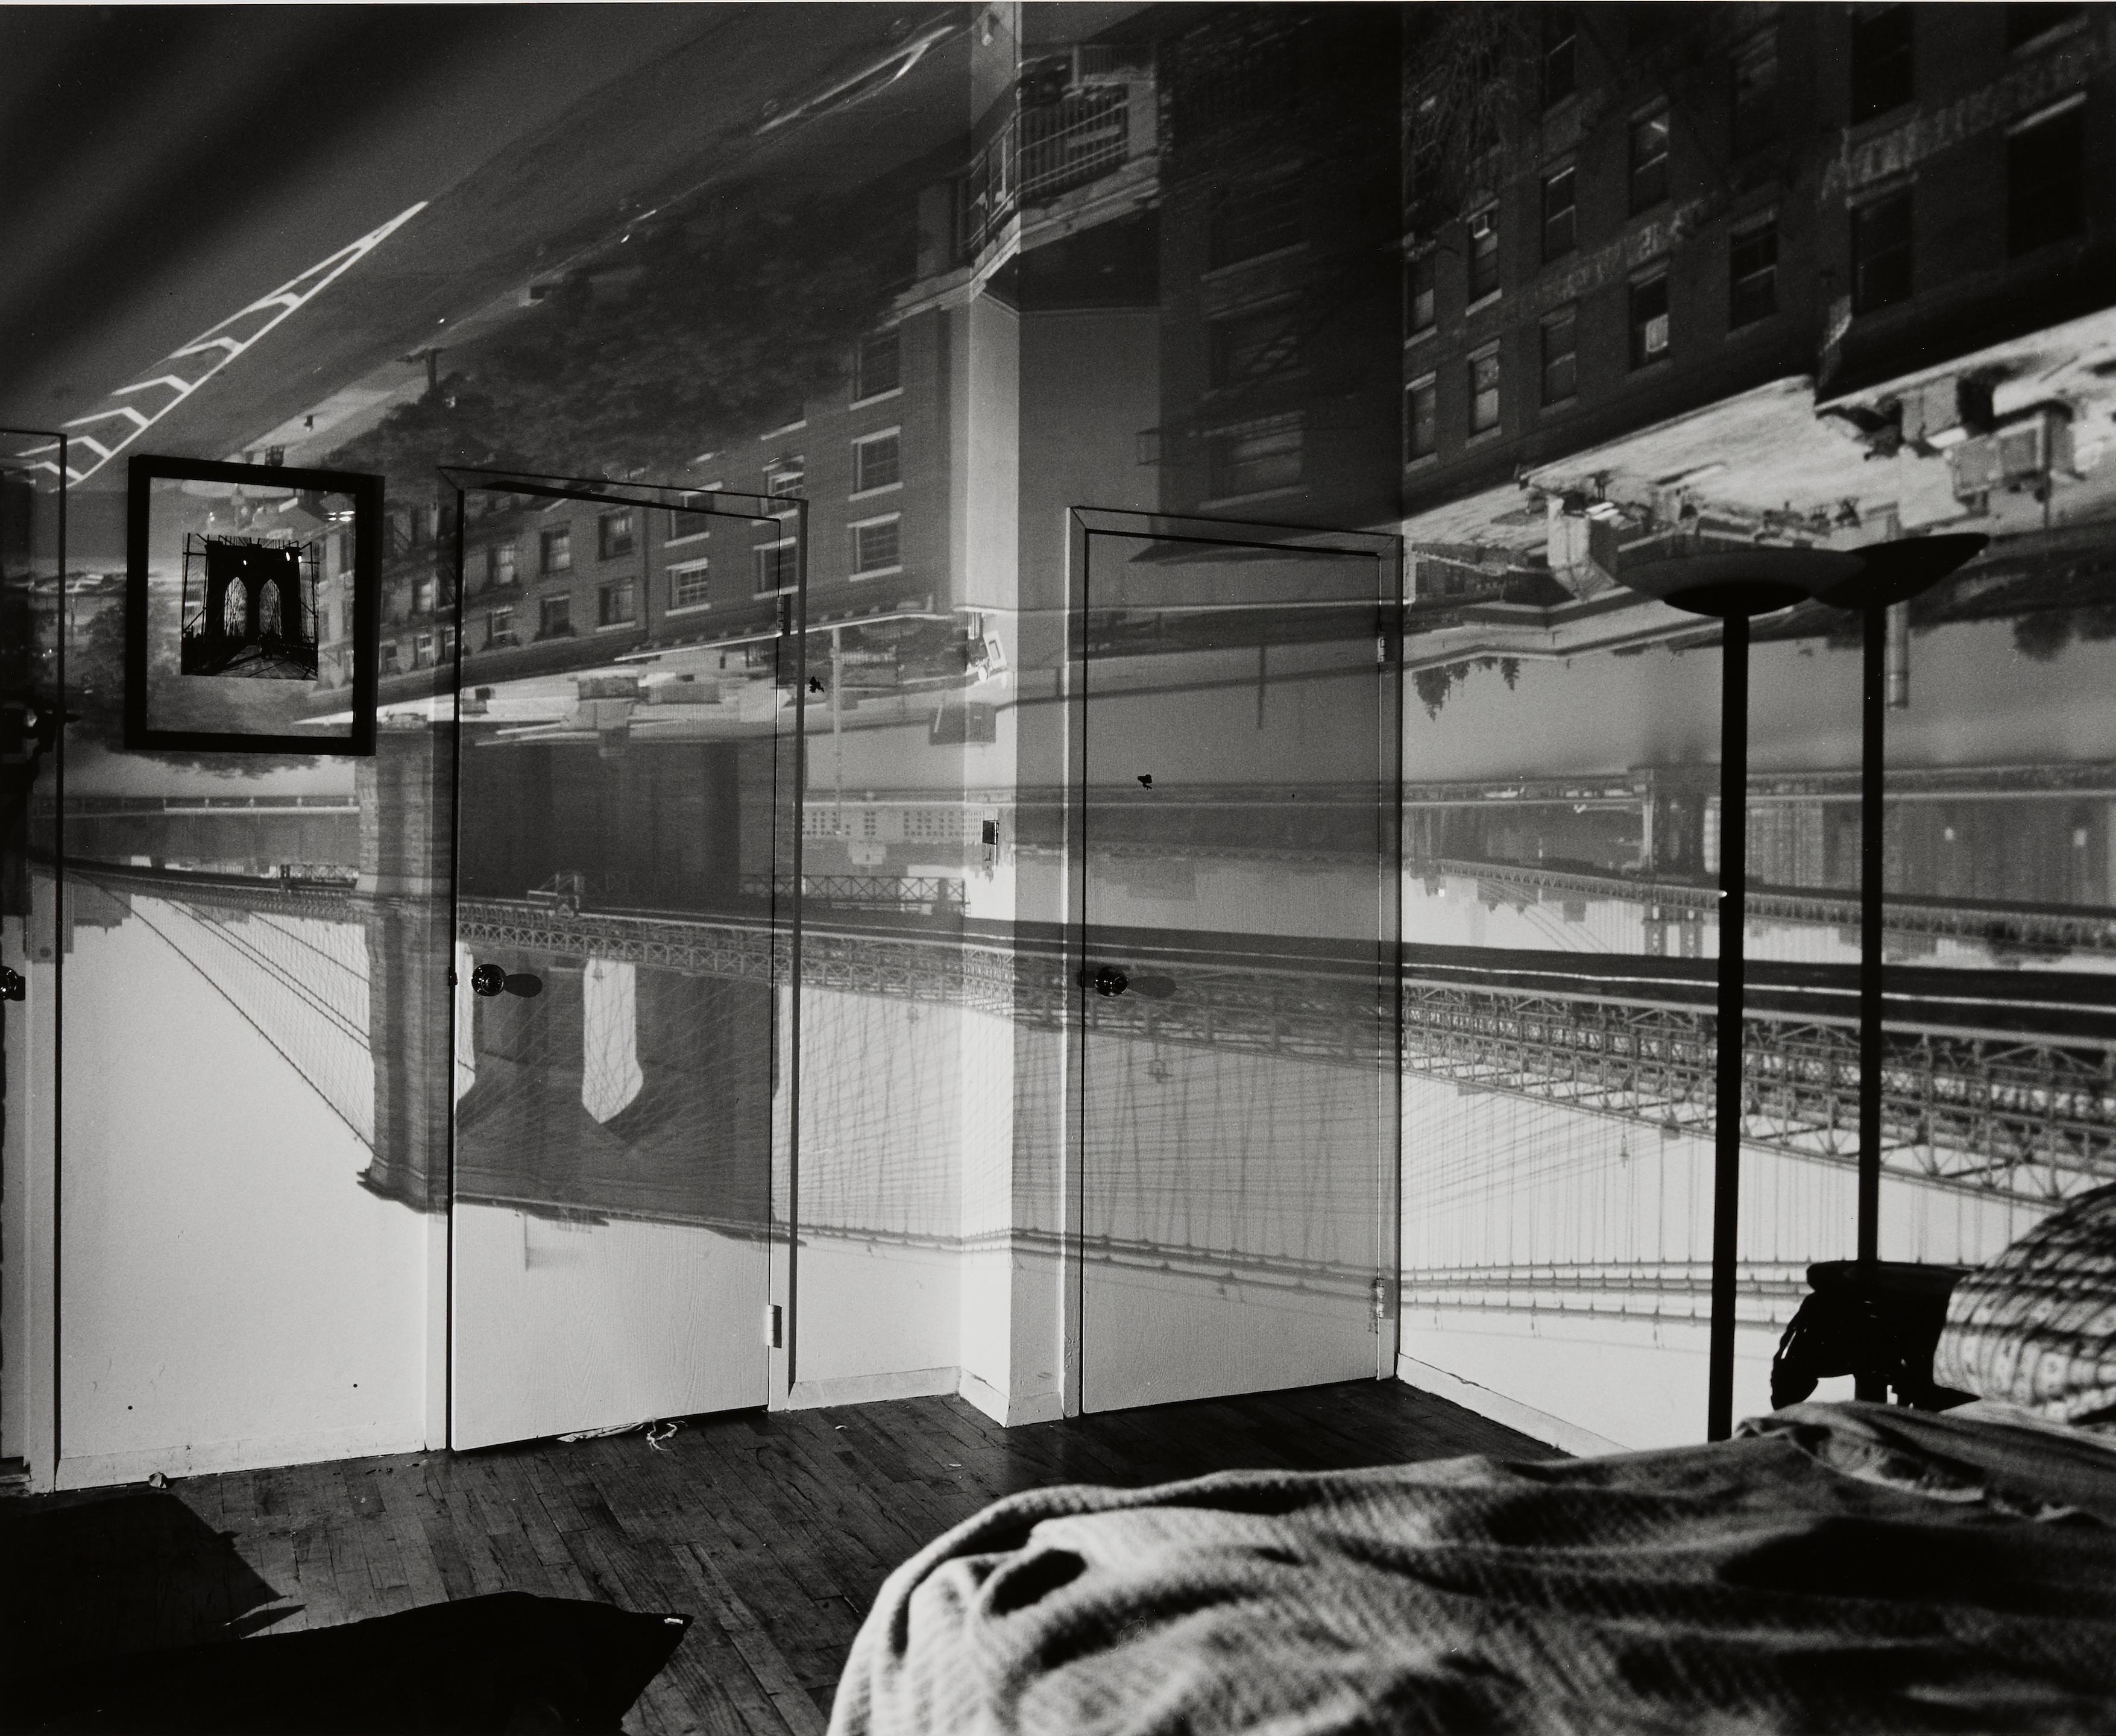 Abelardo  Morell (born 1948); Camera Obscura Image of the Brooklyn Bridge in Bedroom;